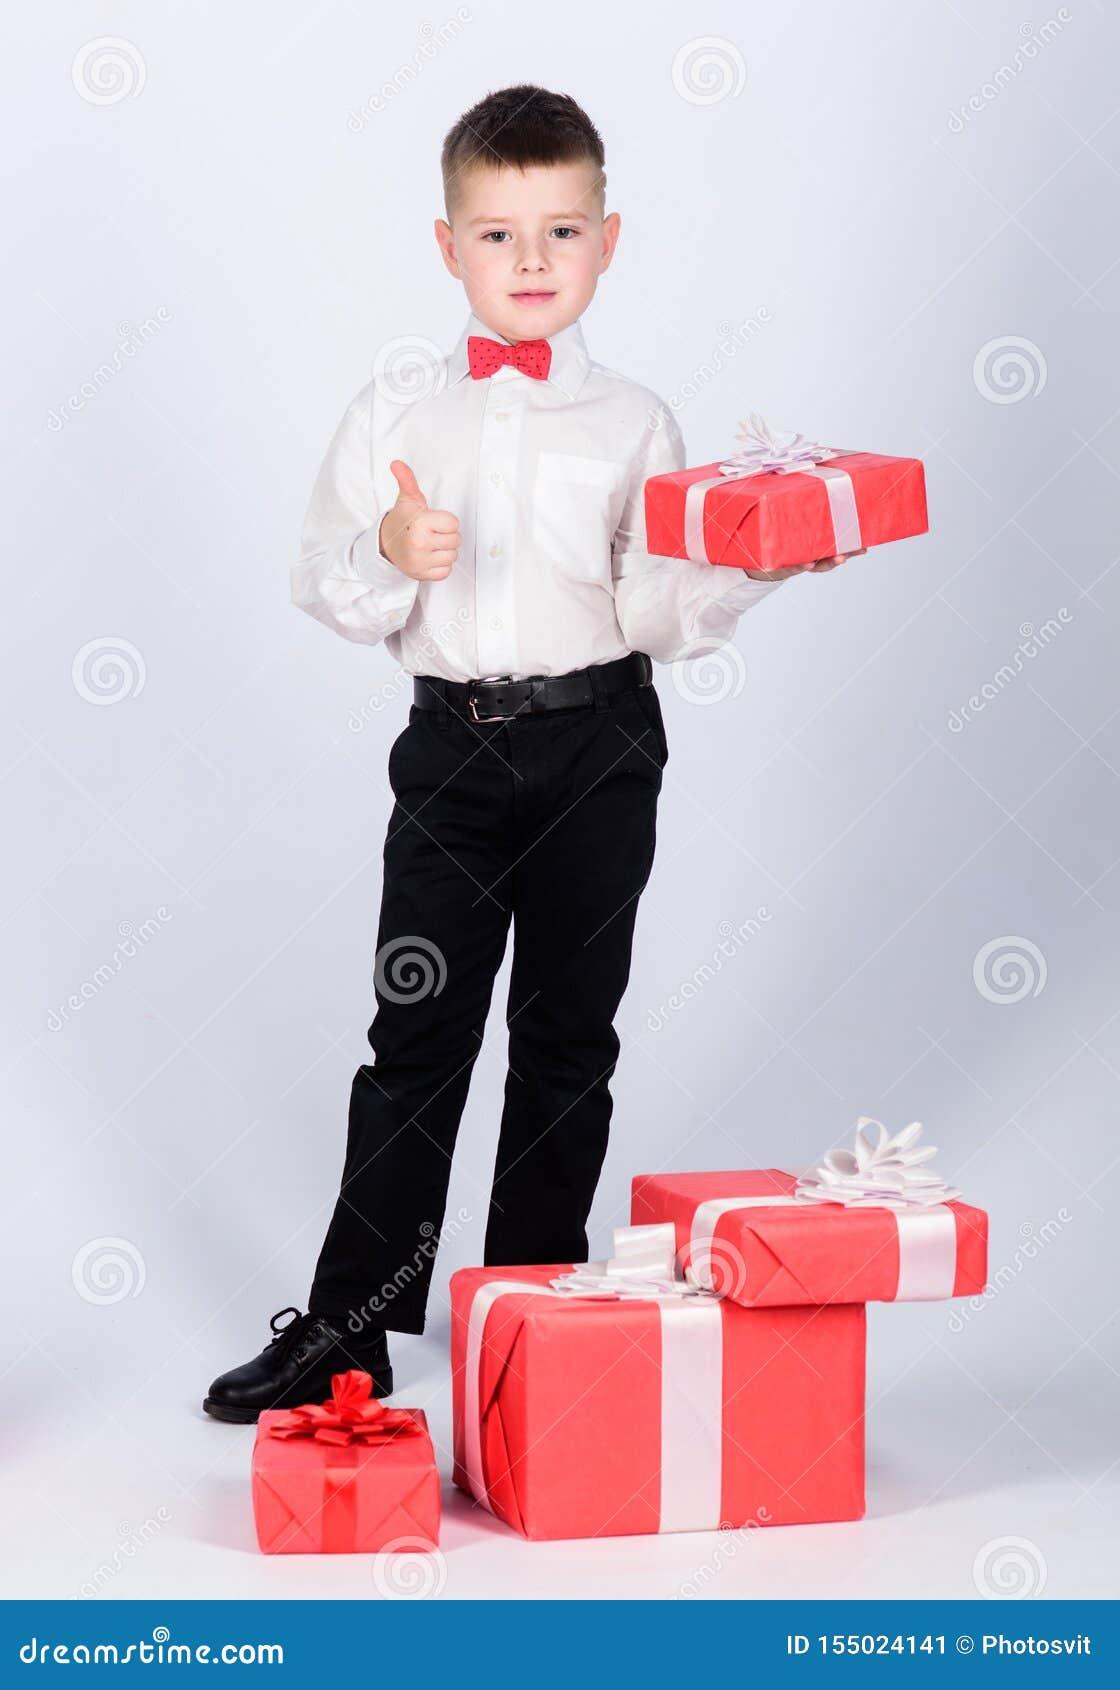 R μικρό παιδί με το δώρο ημέρας βαλεντίνων E Επόμενη μέρα των Χριστουγέννων Νέο έτος ύφος σμόκιν E